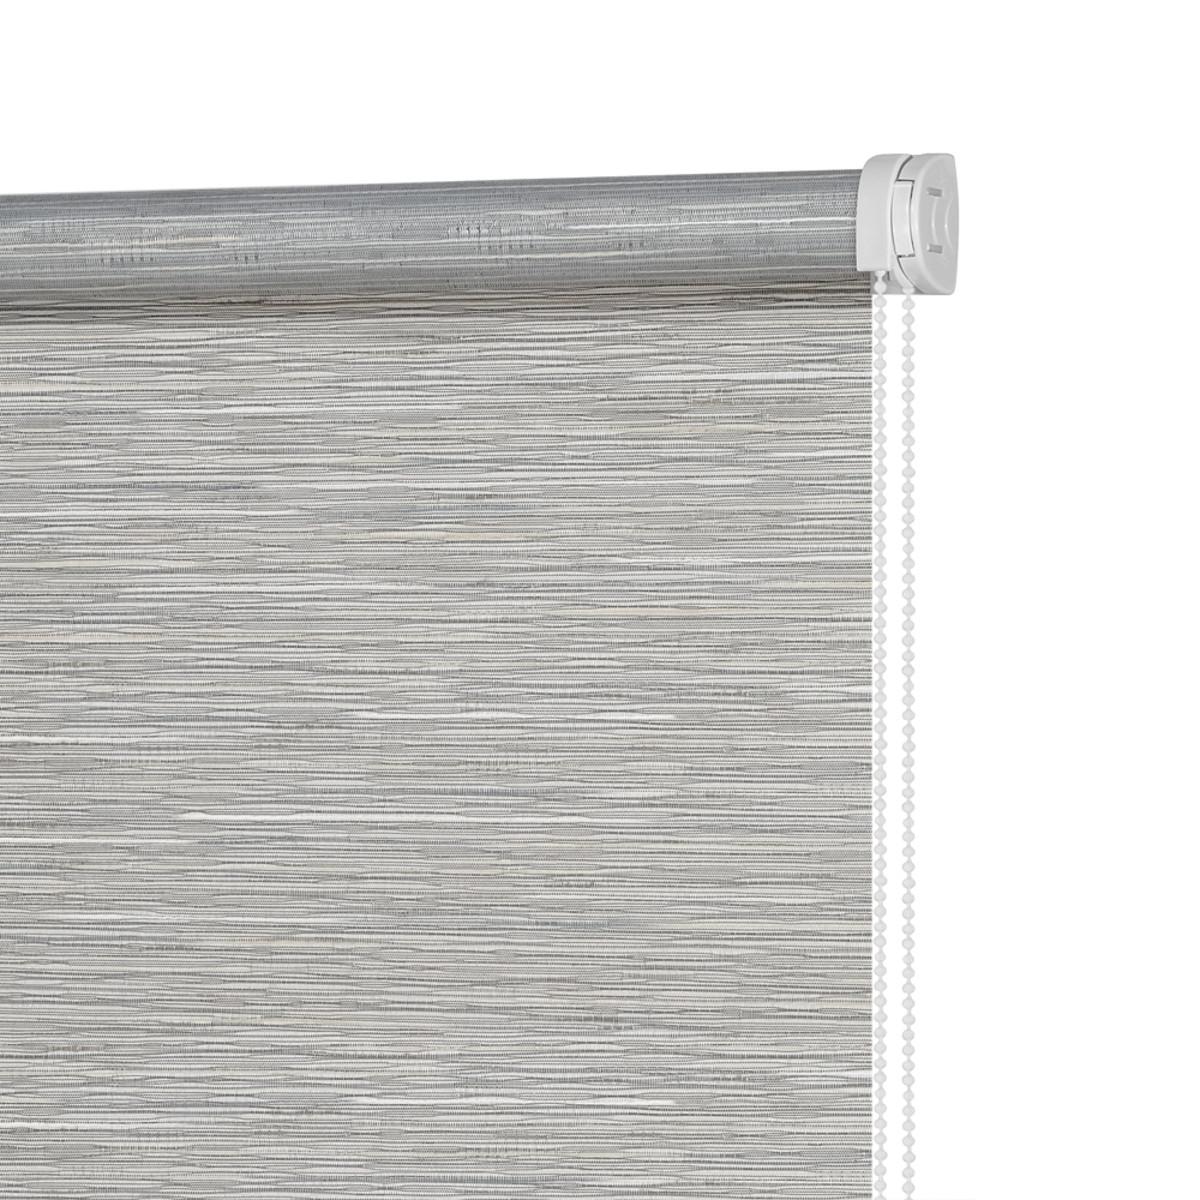 Рулонная Ора Decofest Комо 80Х160 Цвет Серый